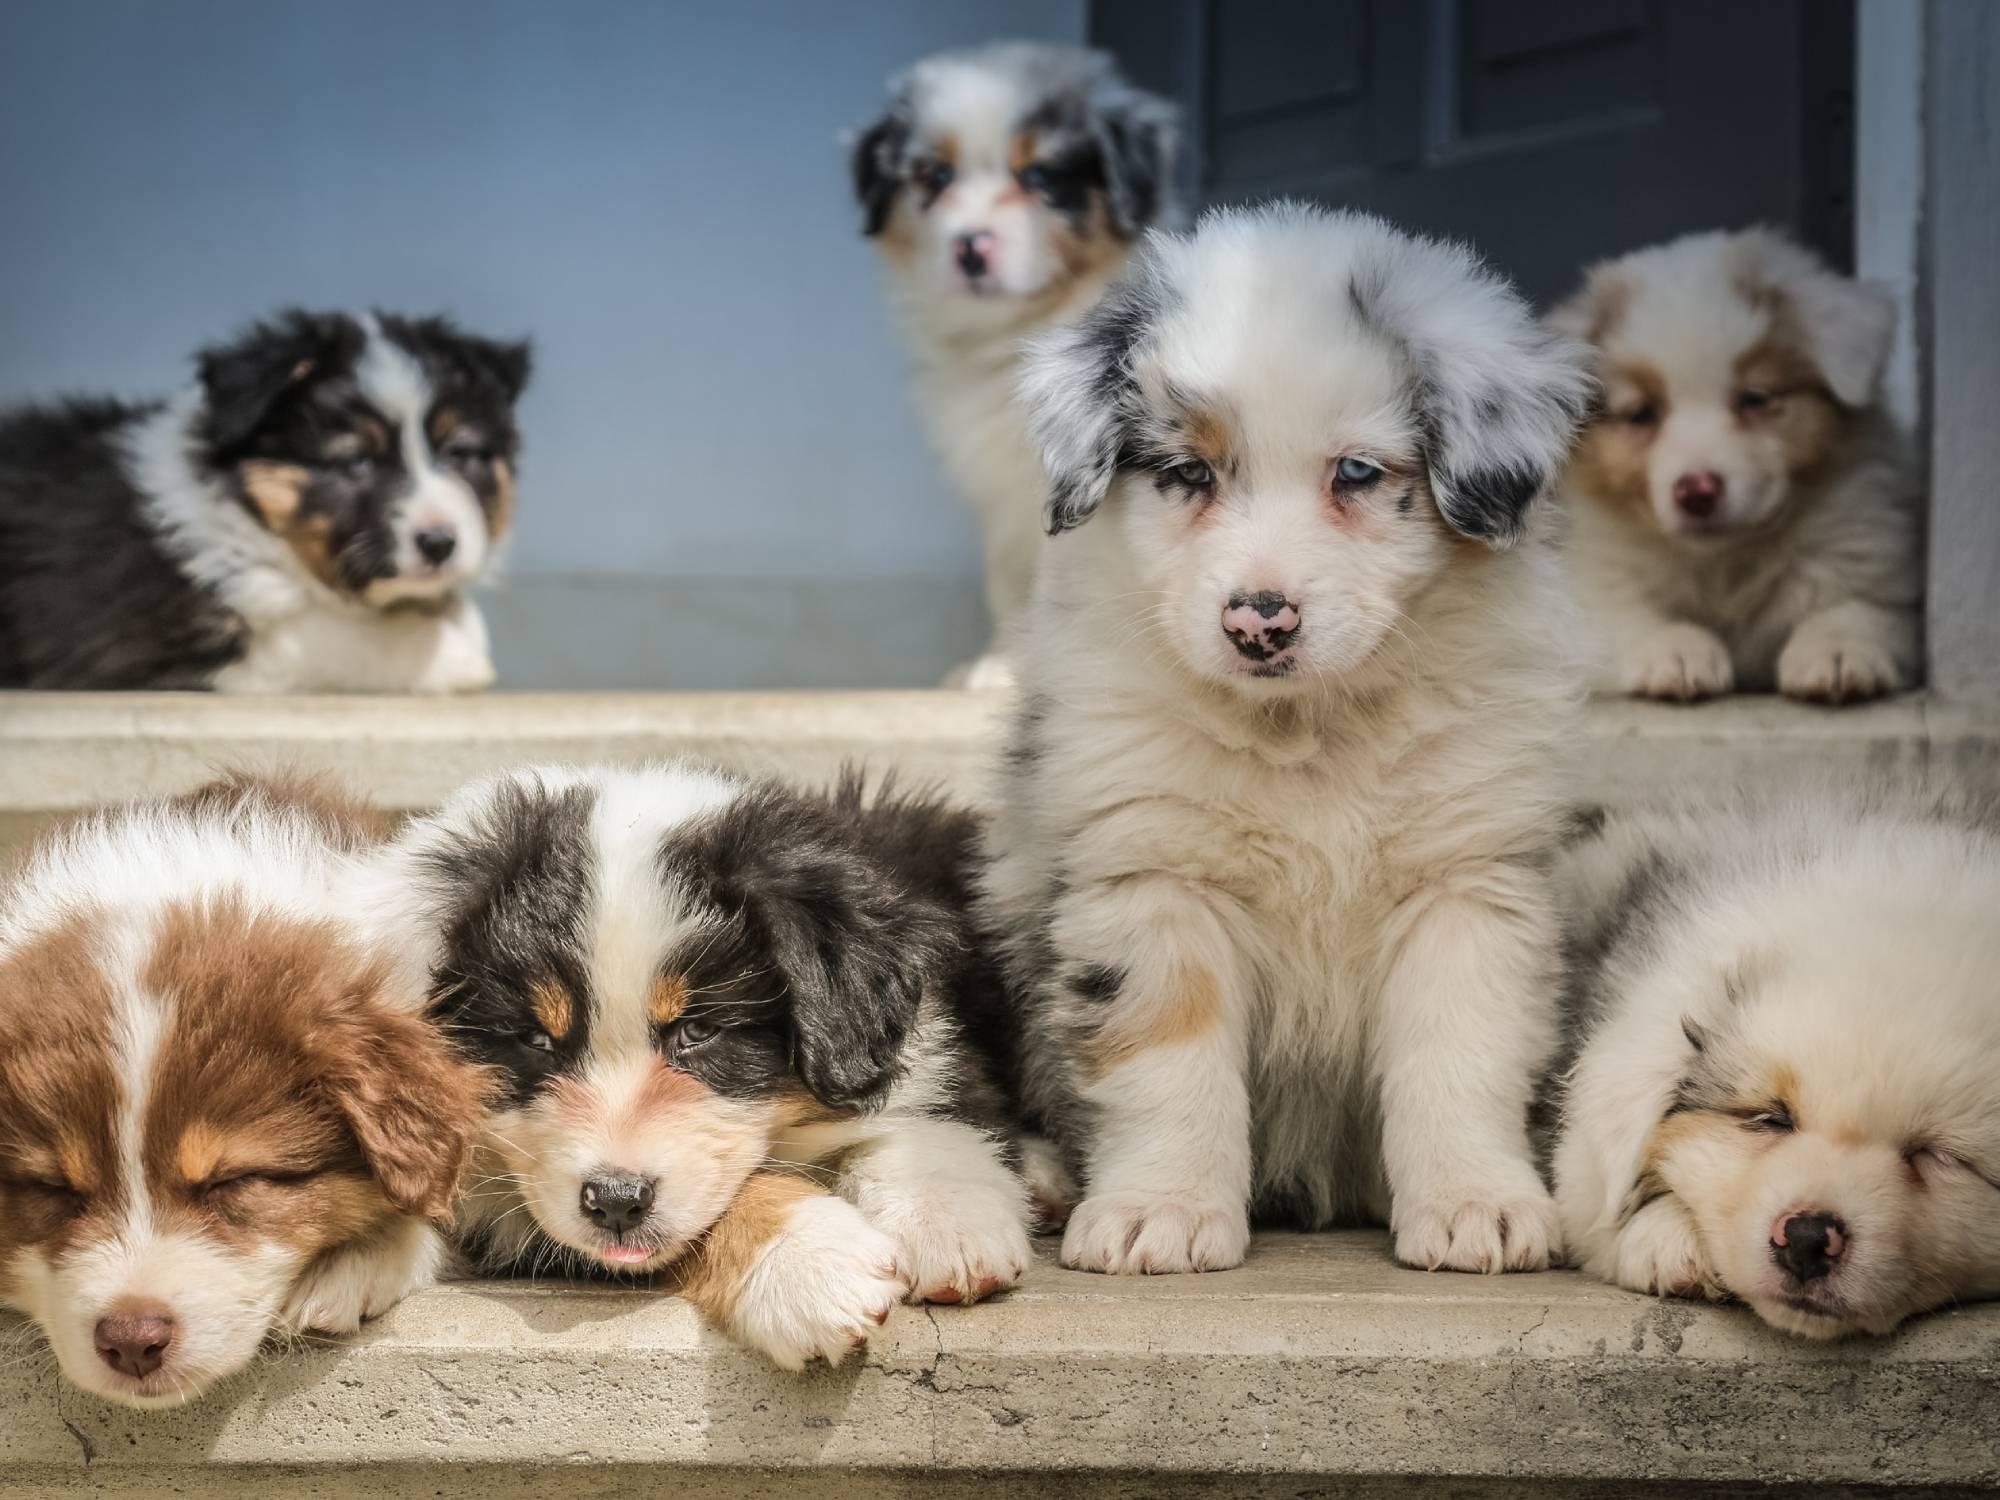 Seven Australian Shepherd puppies on some concrete stairs.